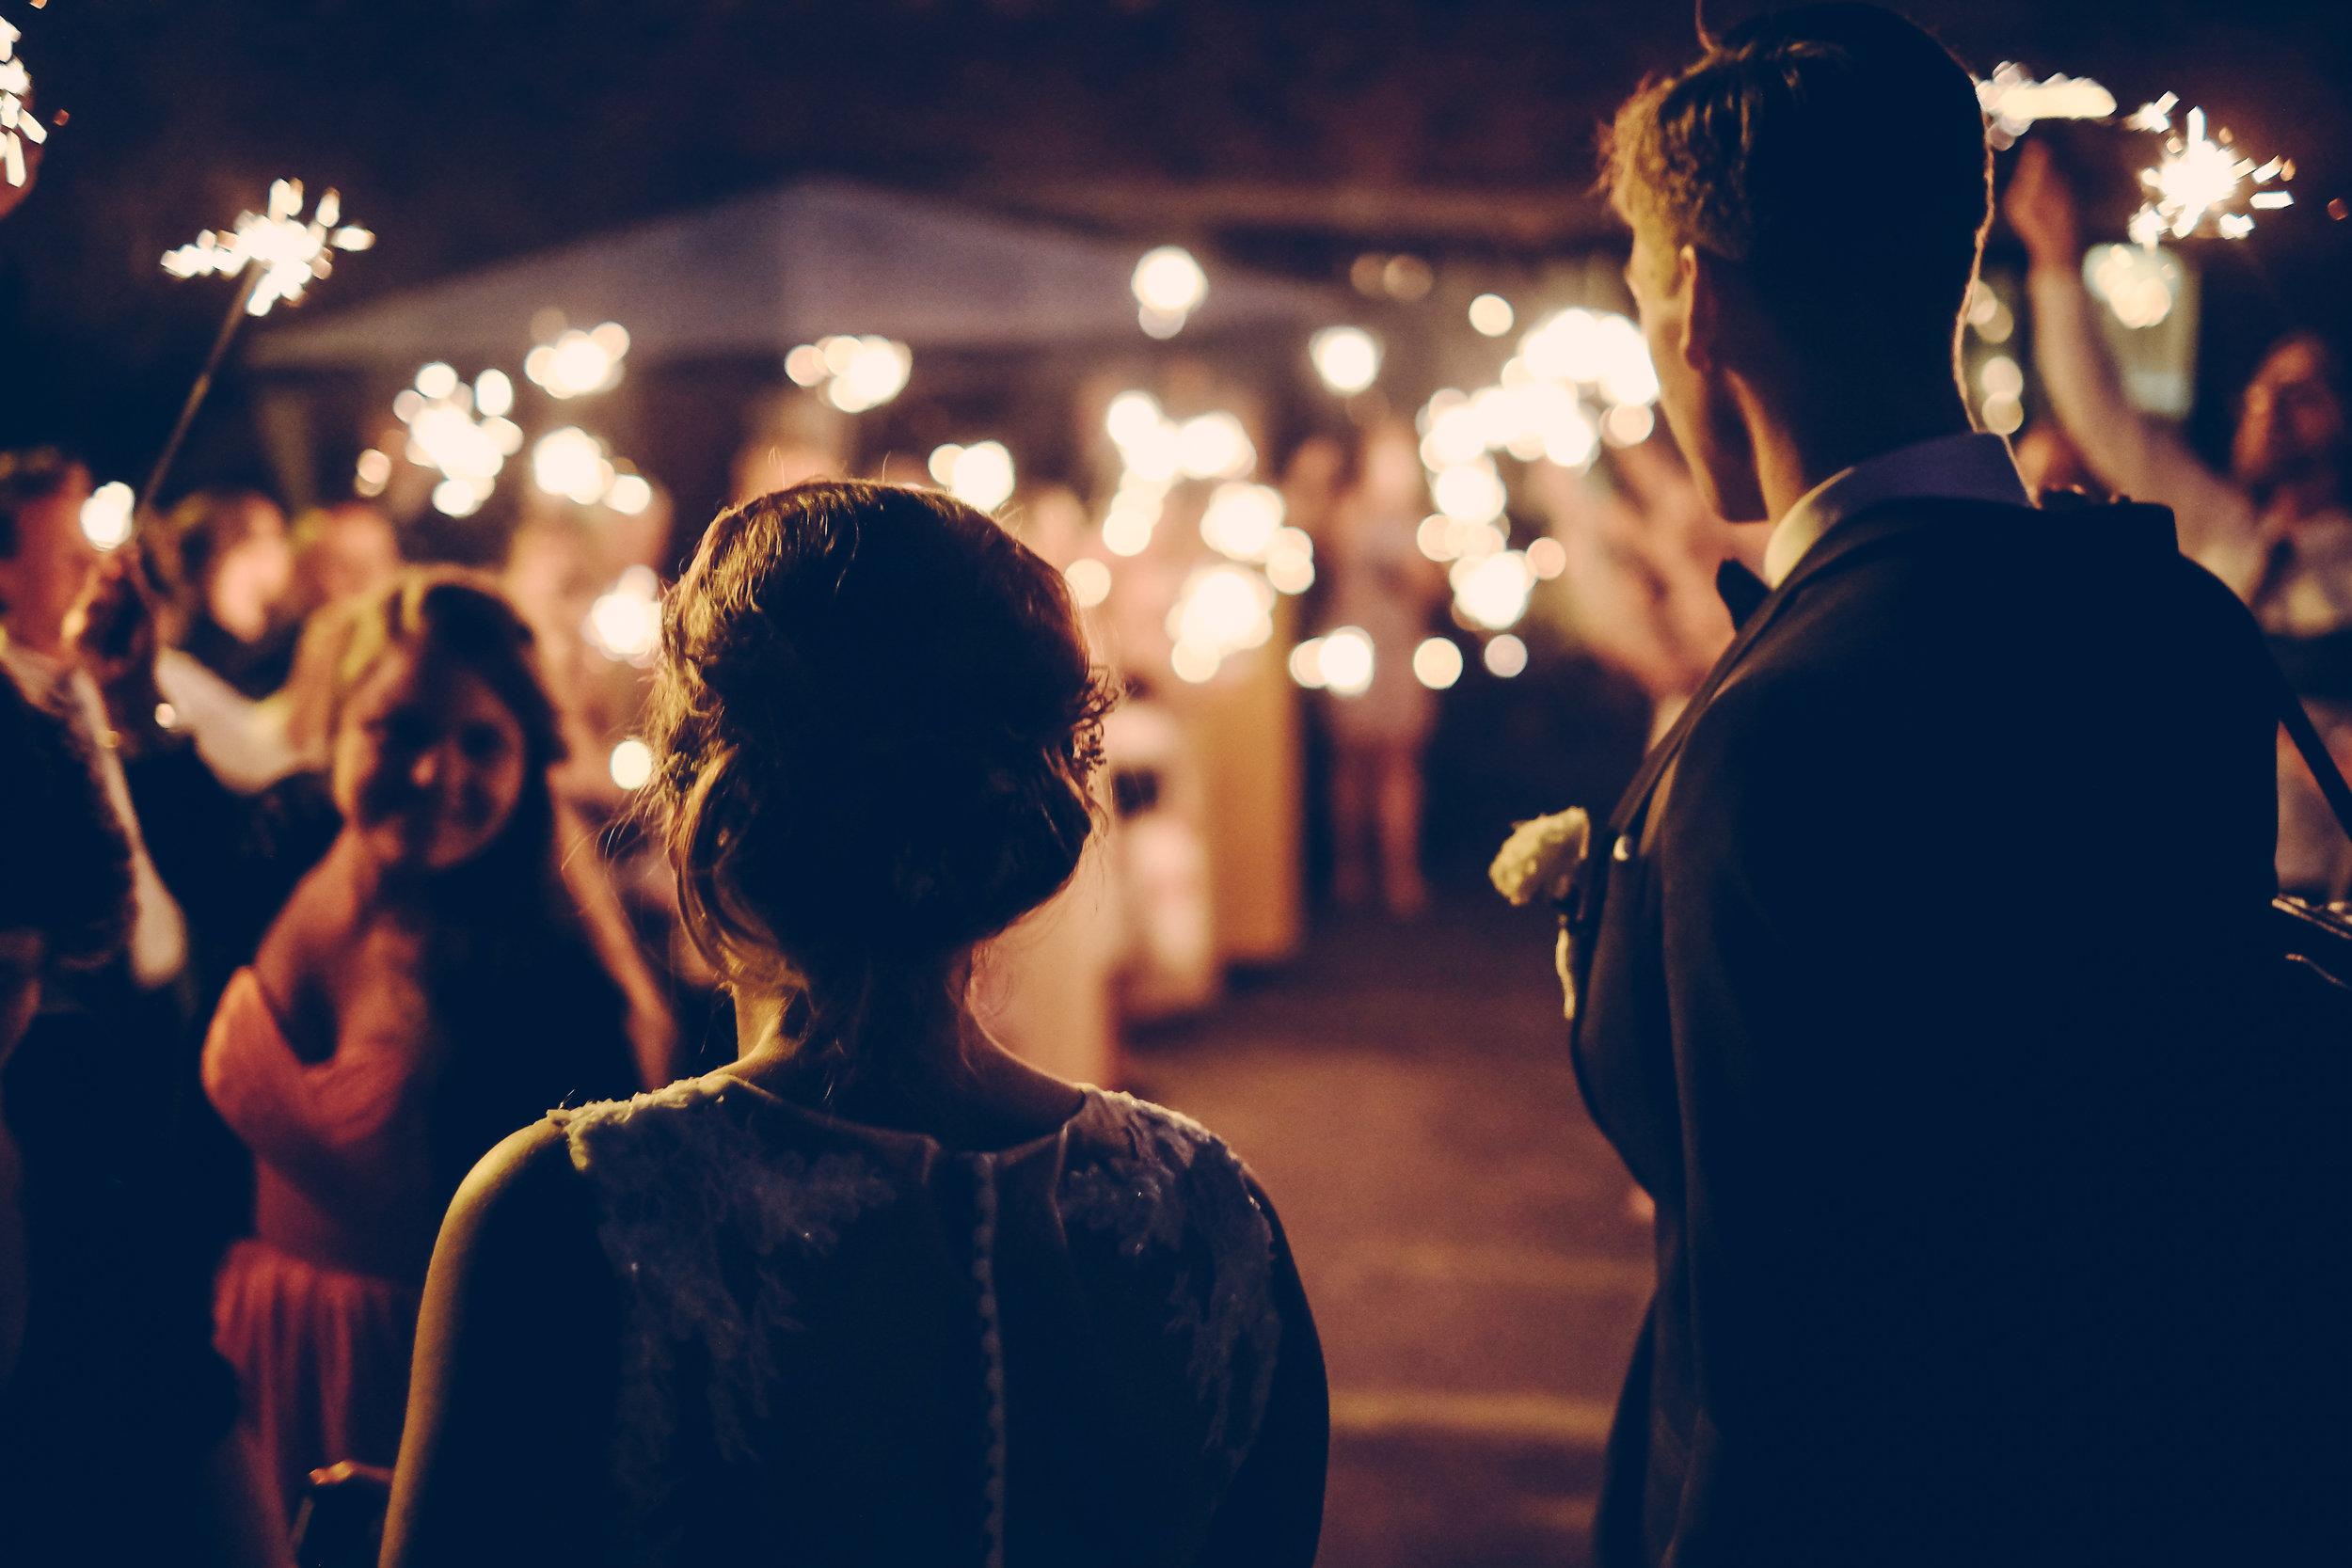 Weddings/Events - bachelor/bachelorette parties, weddings, stags, etc